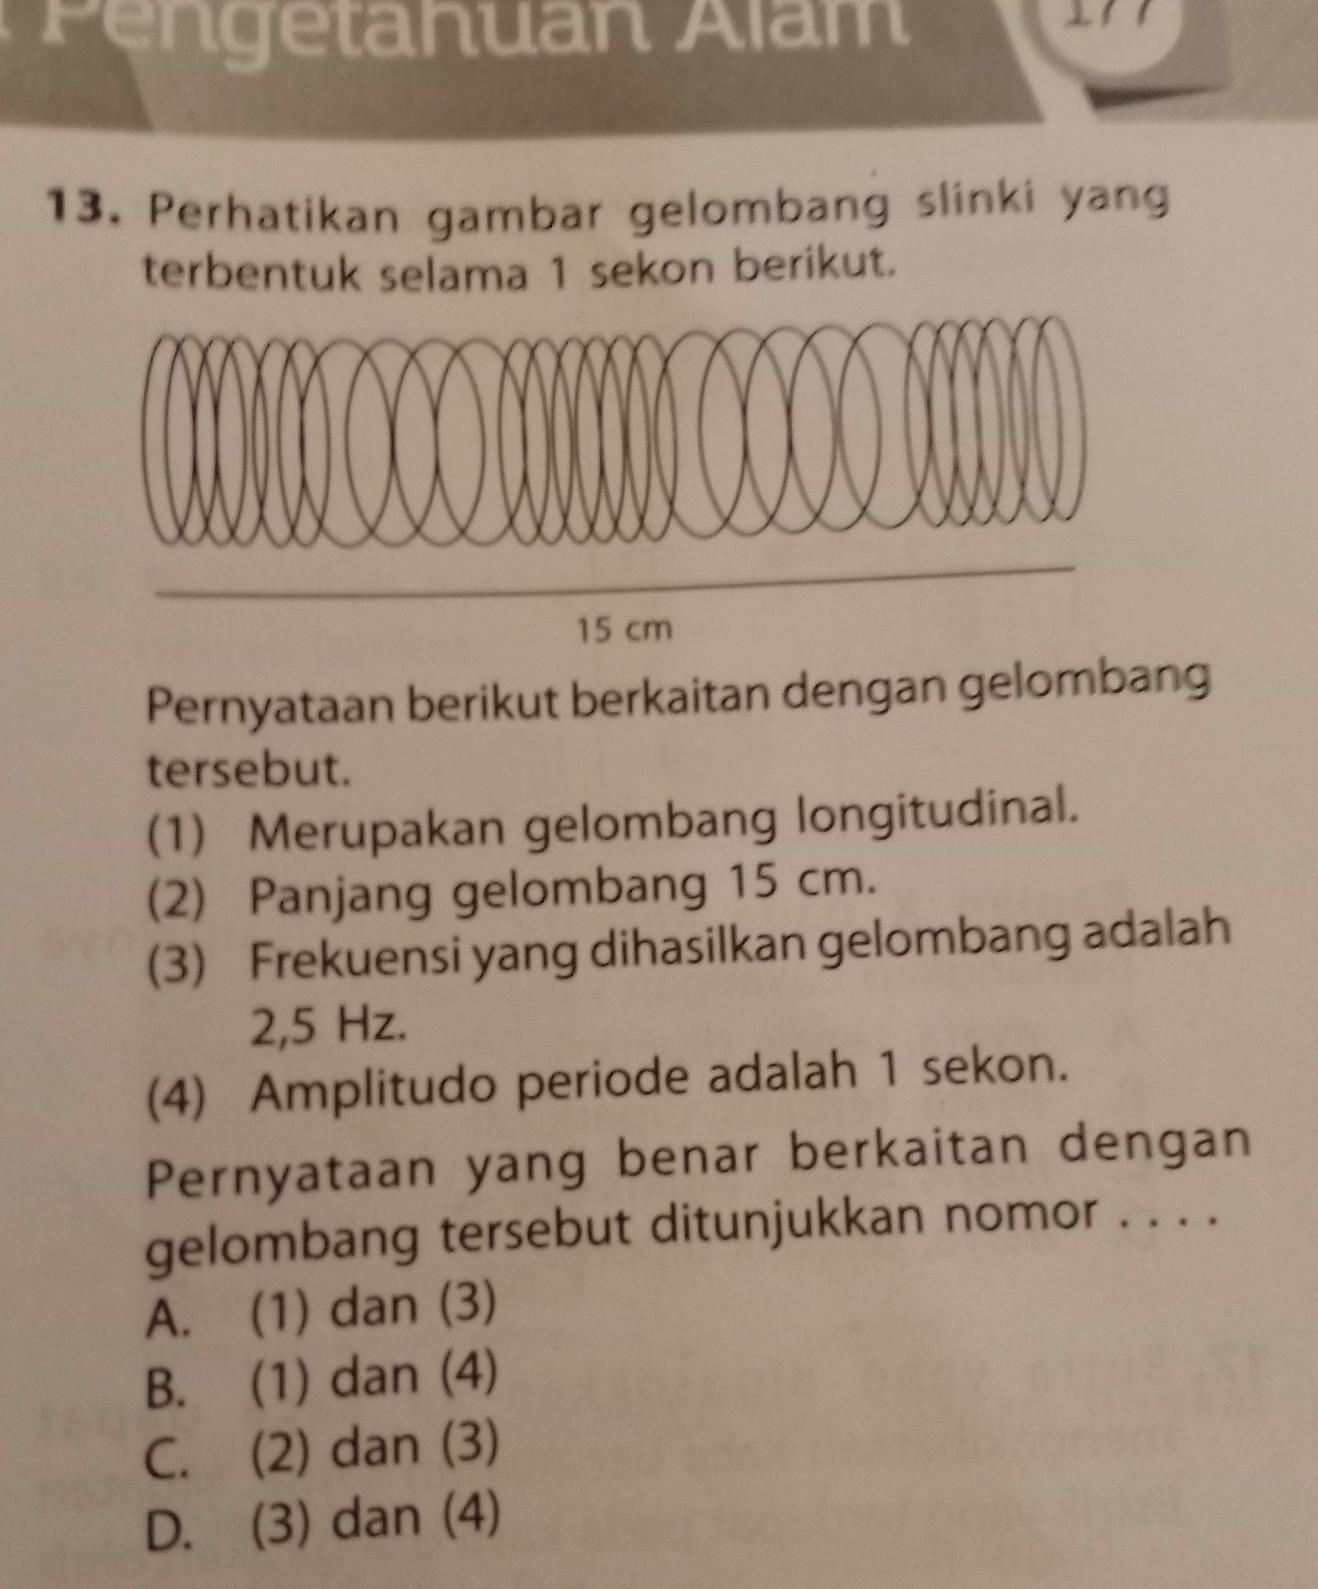 Gelombang Slinki : gelombang, slinki, Rumus, Cepat, Rambat, Gelombang, Longitudinal, IlmuSosial.id